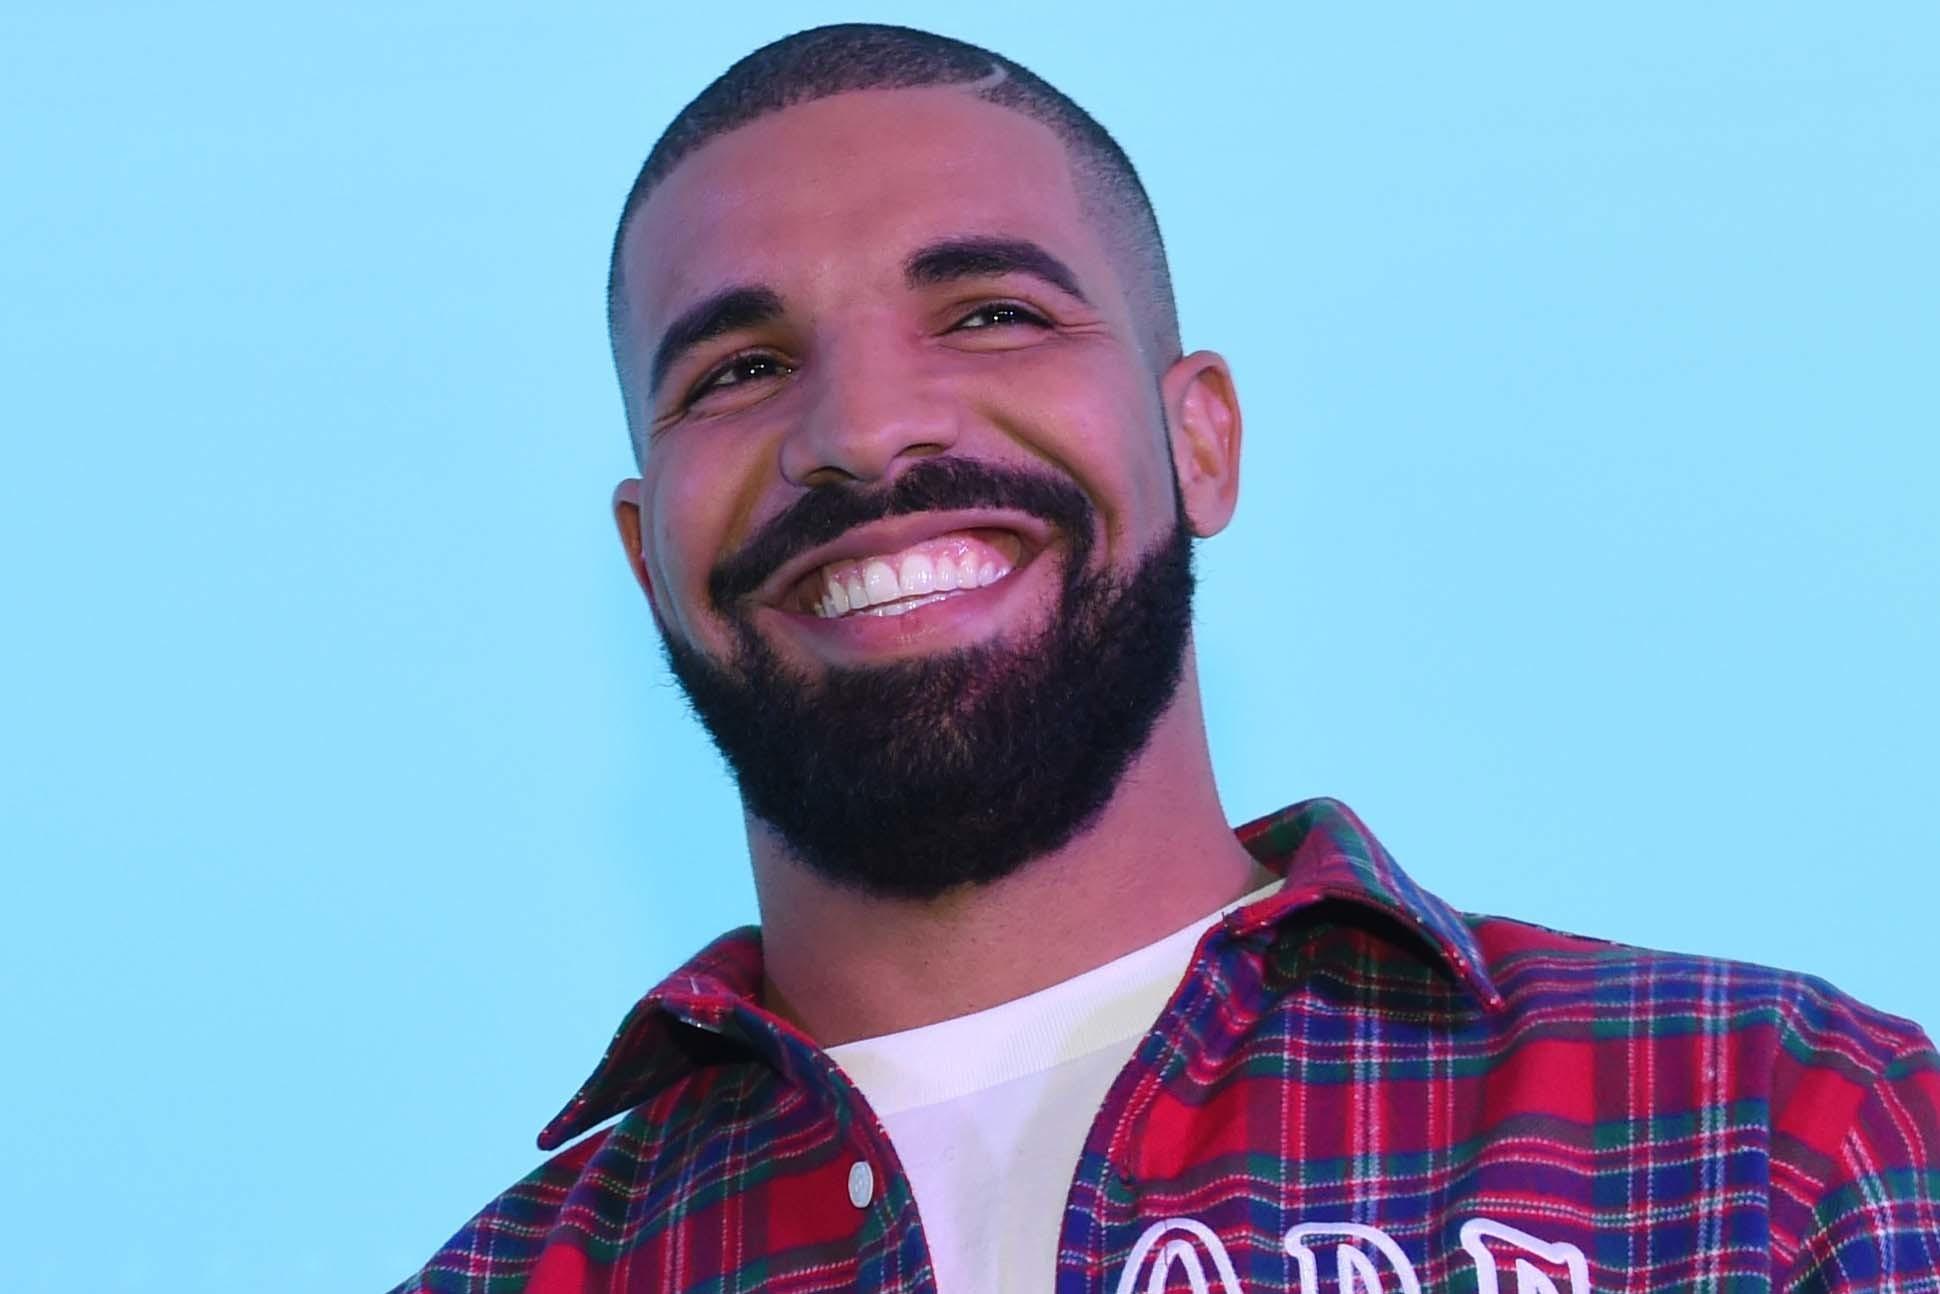 Res: 1940x1294, Drake HD wallpapers #1